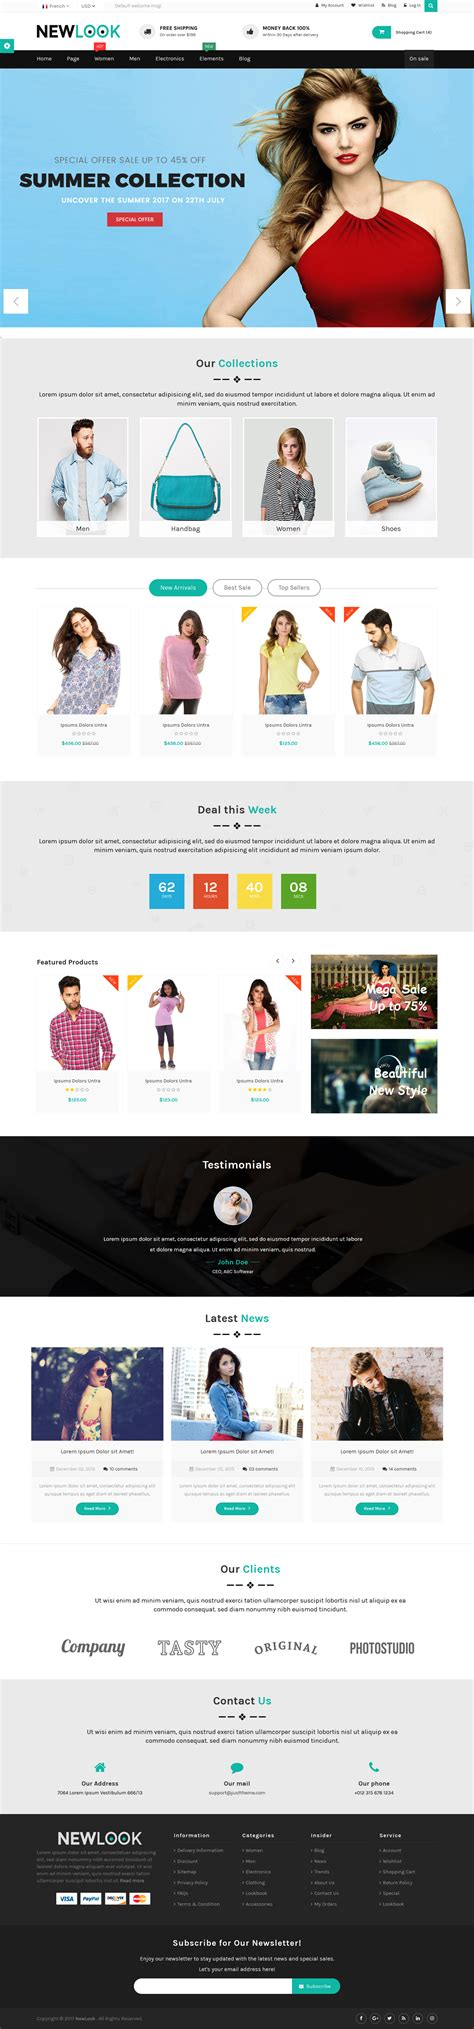 printable version of fdcpa newlook responsive multipurpose e commerce html template